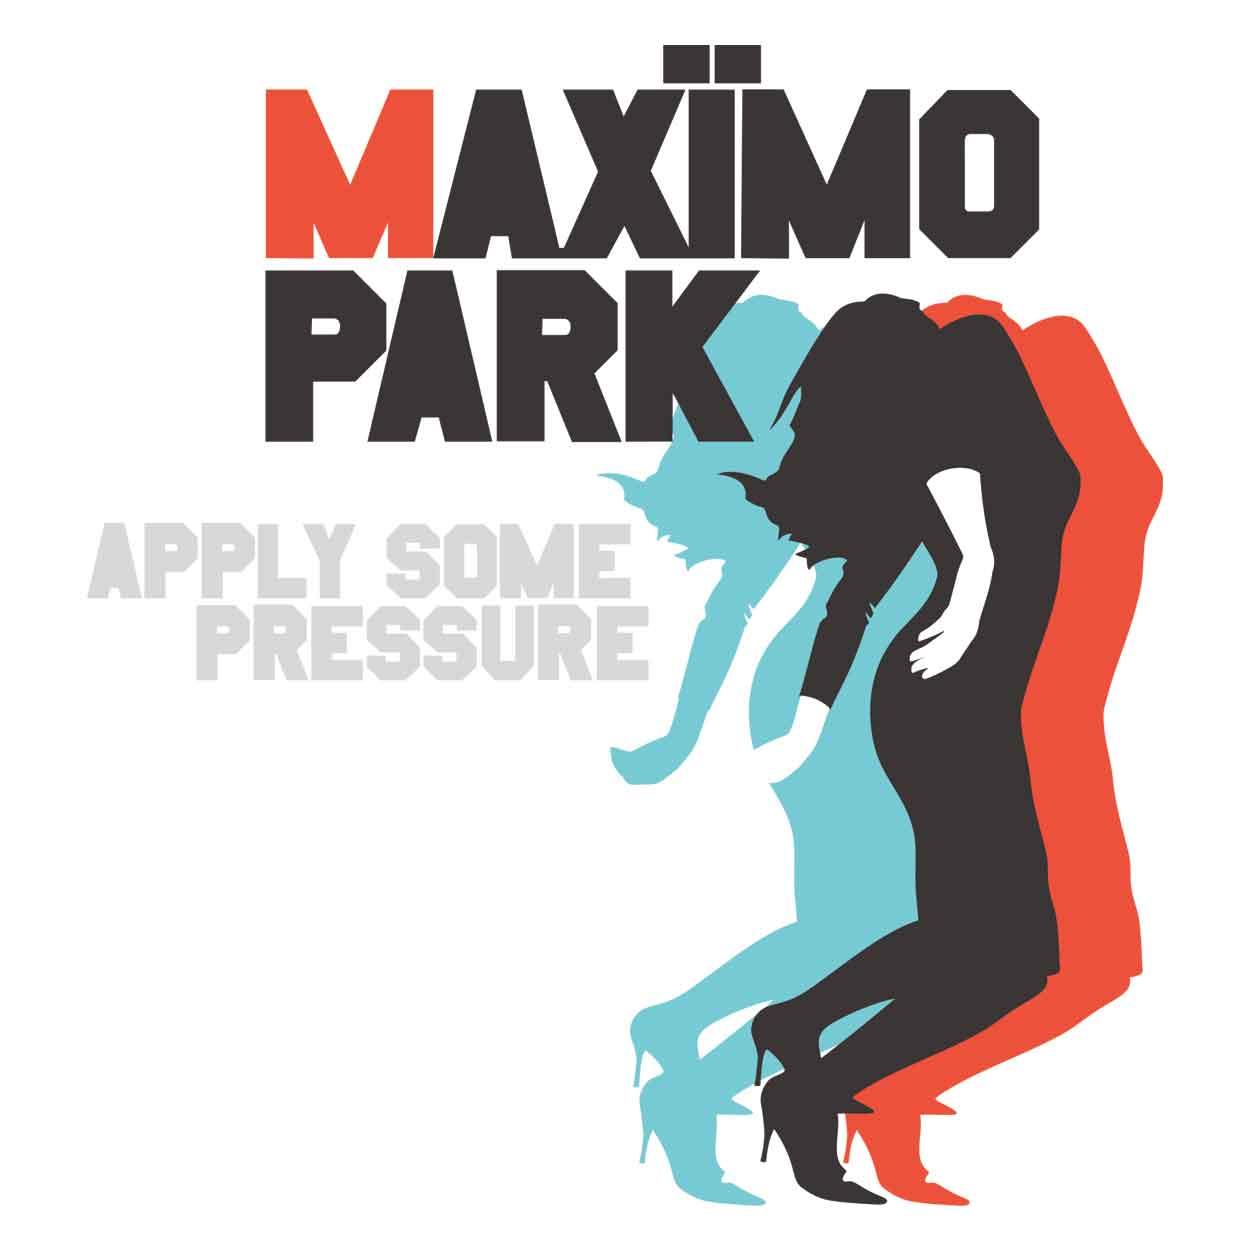 Camiseta - Apply Some Pressure - Maximo Park - Feminino